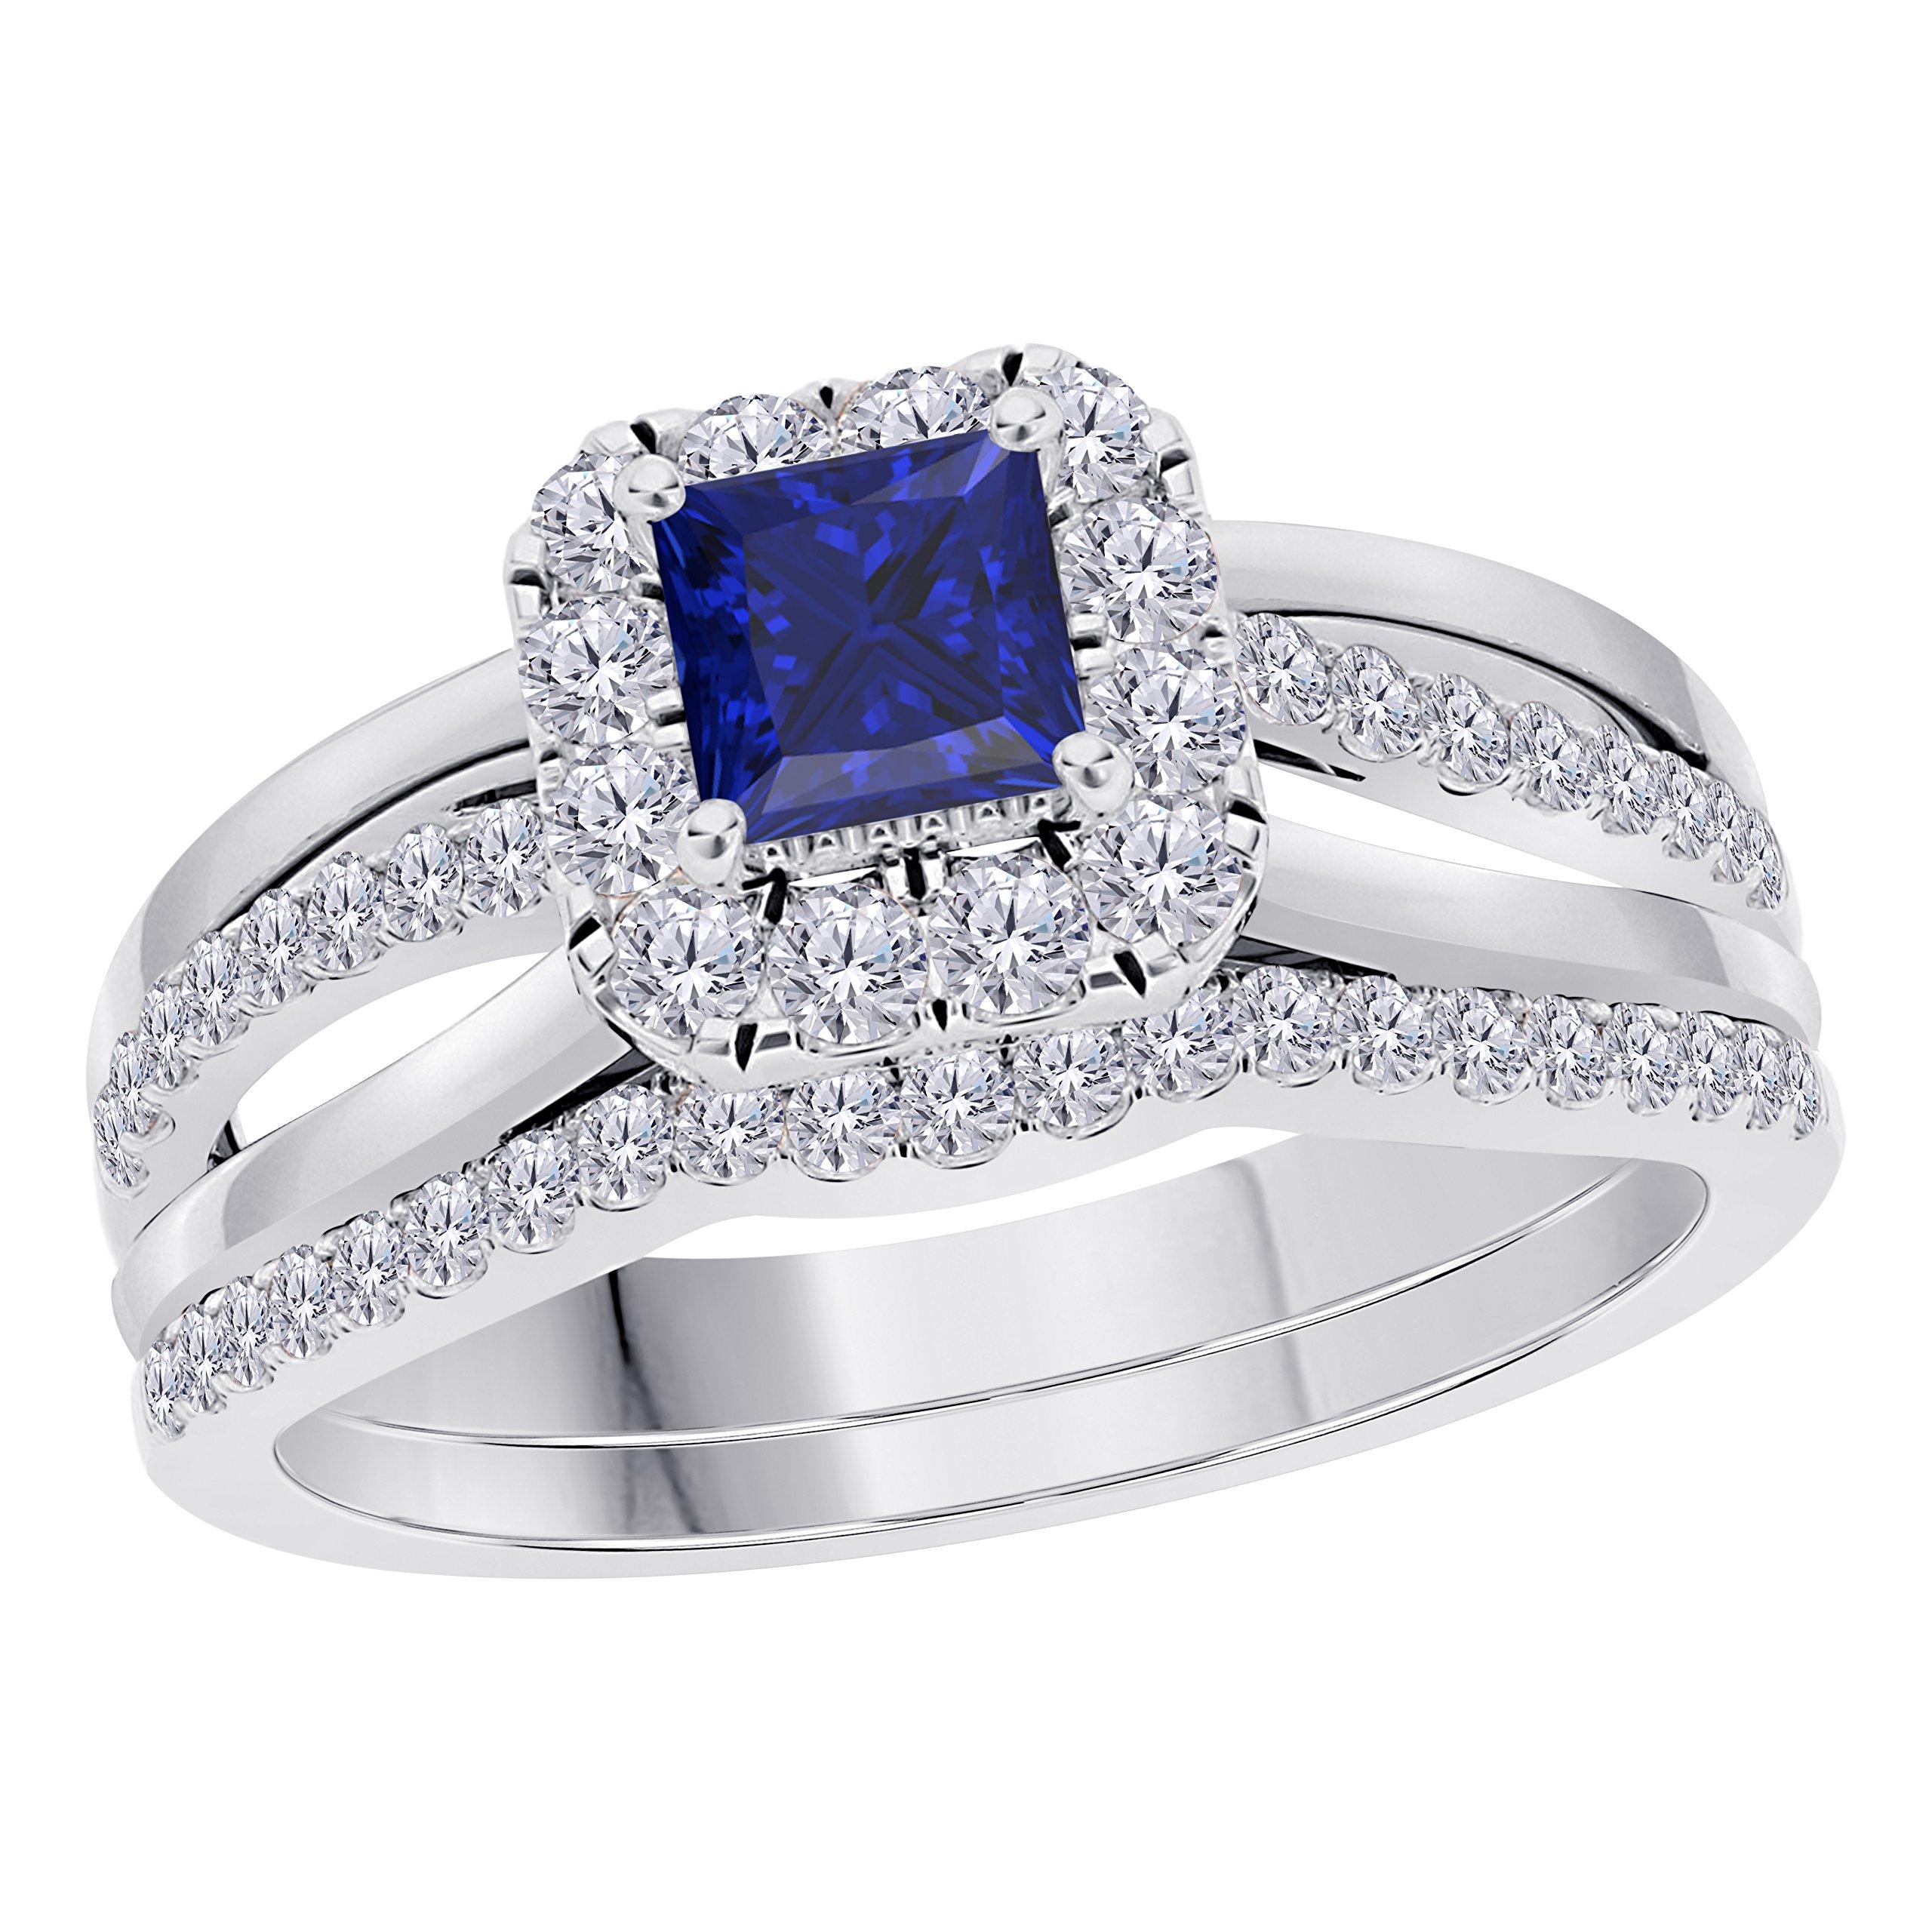 Jewelryhub 2CT Princess Cut Cz Blue Sapphire 925 Sterling Silver Wedding Bridal Set Split Shank Halo Engagement Ring Set Size 4-12